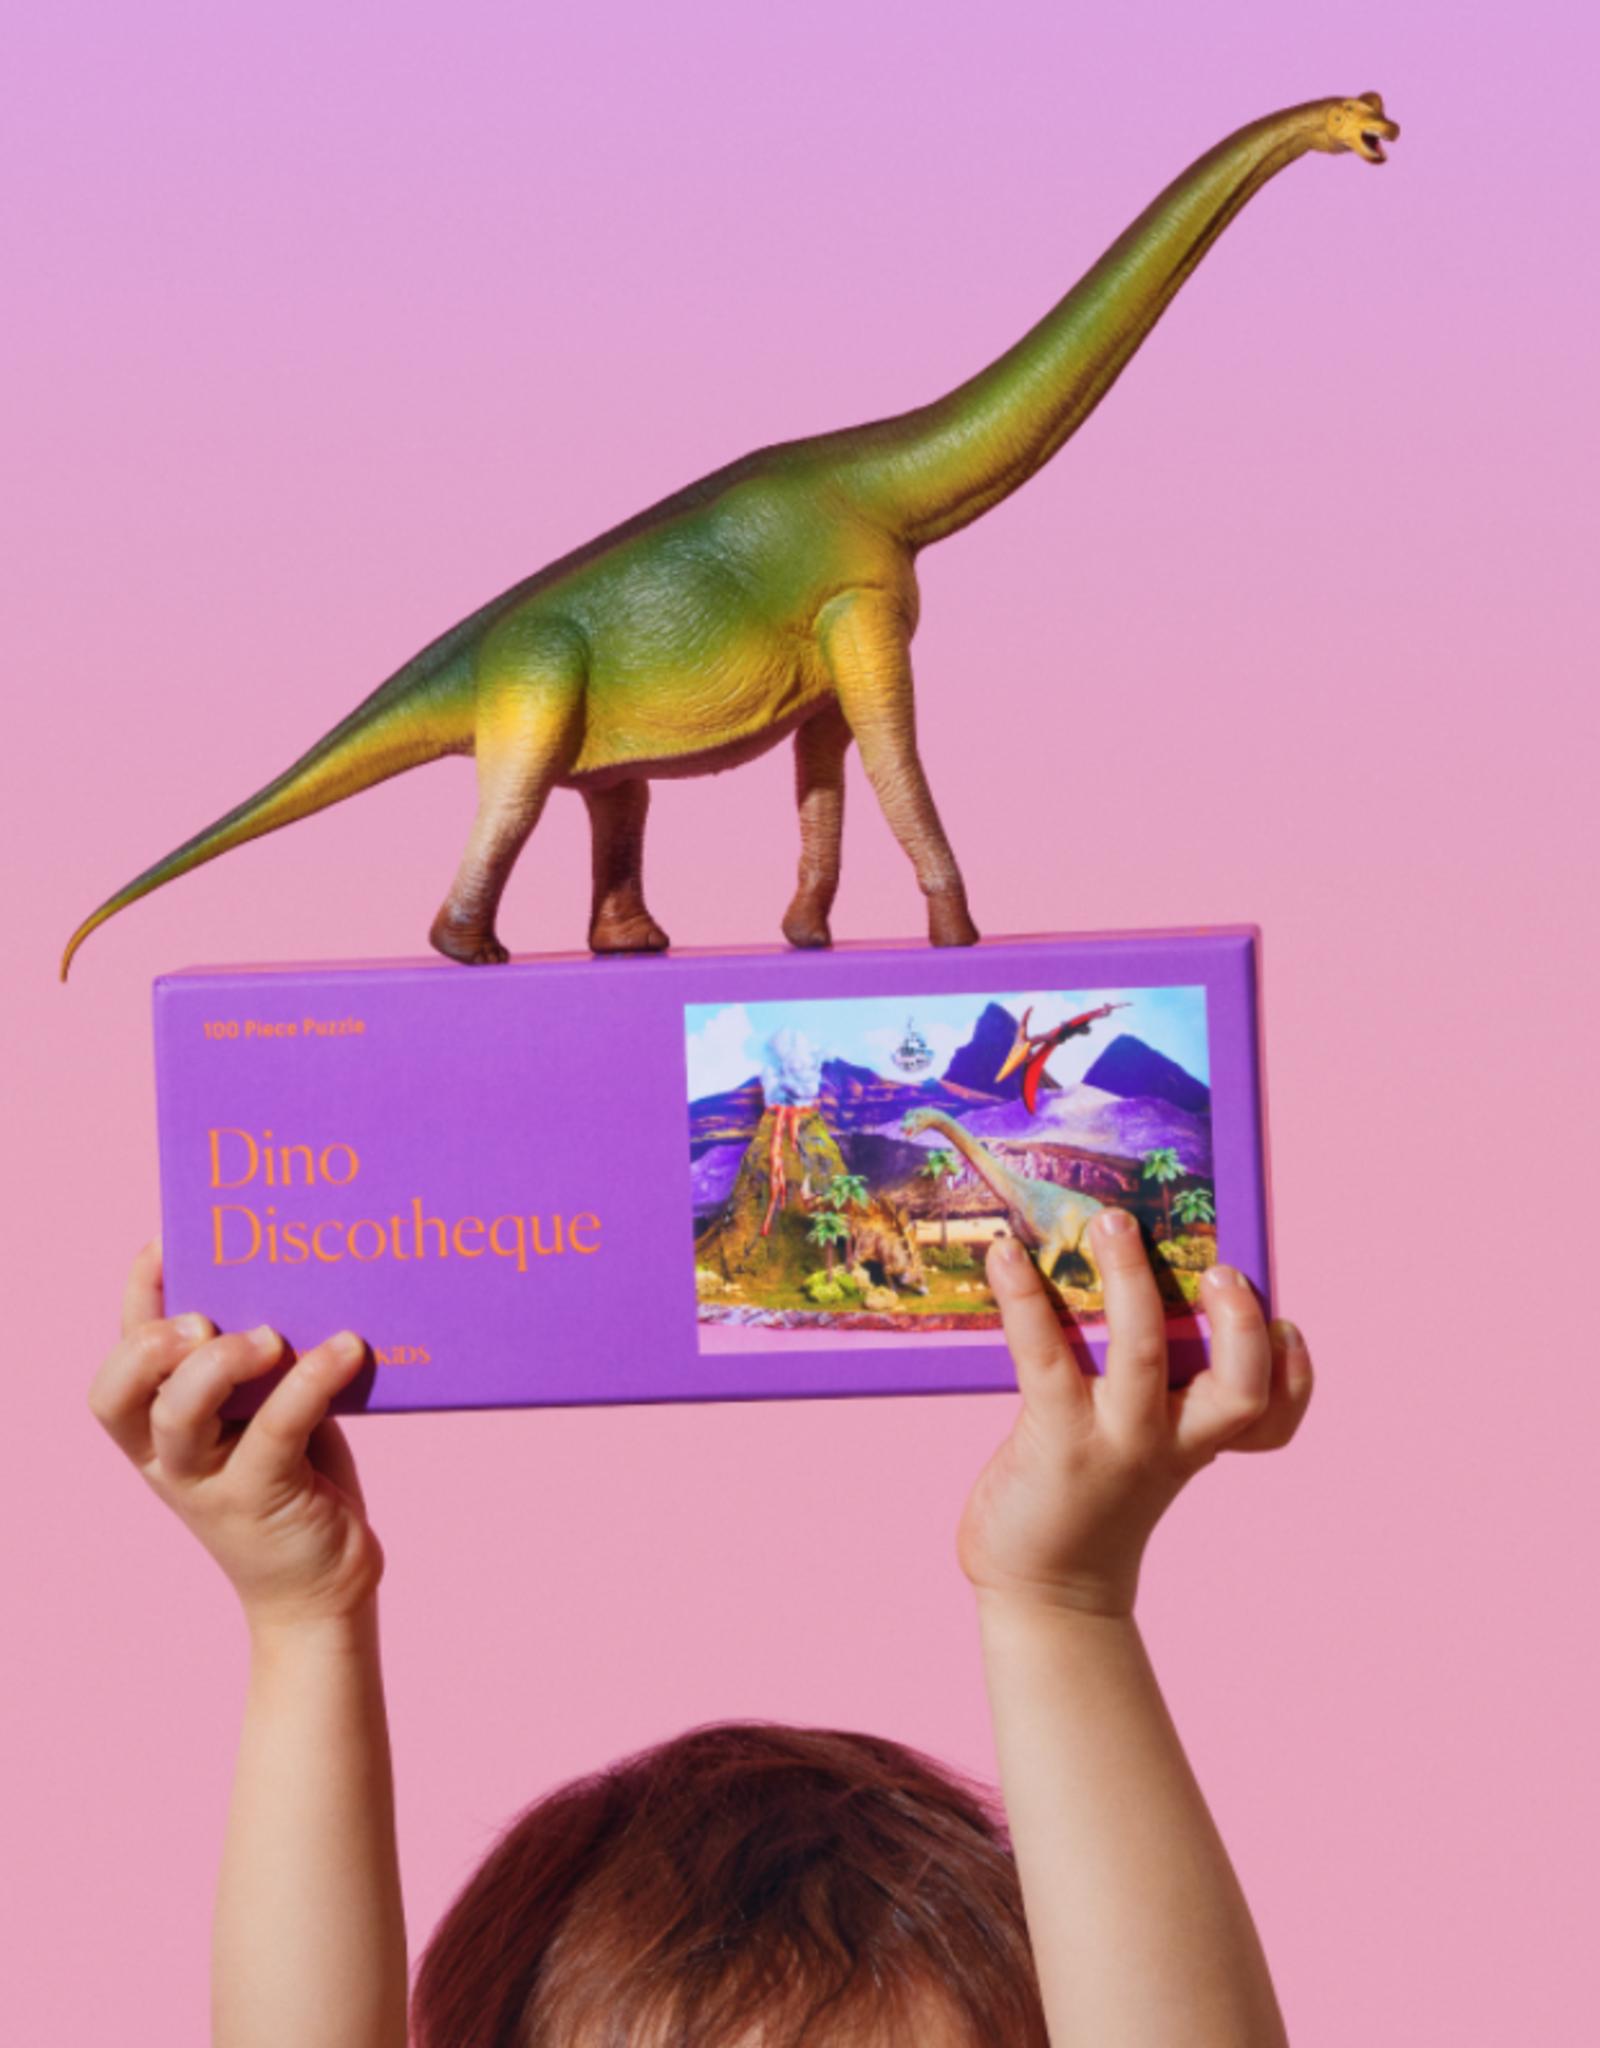 Dino Discotheque Puzzle